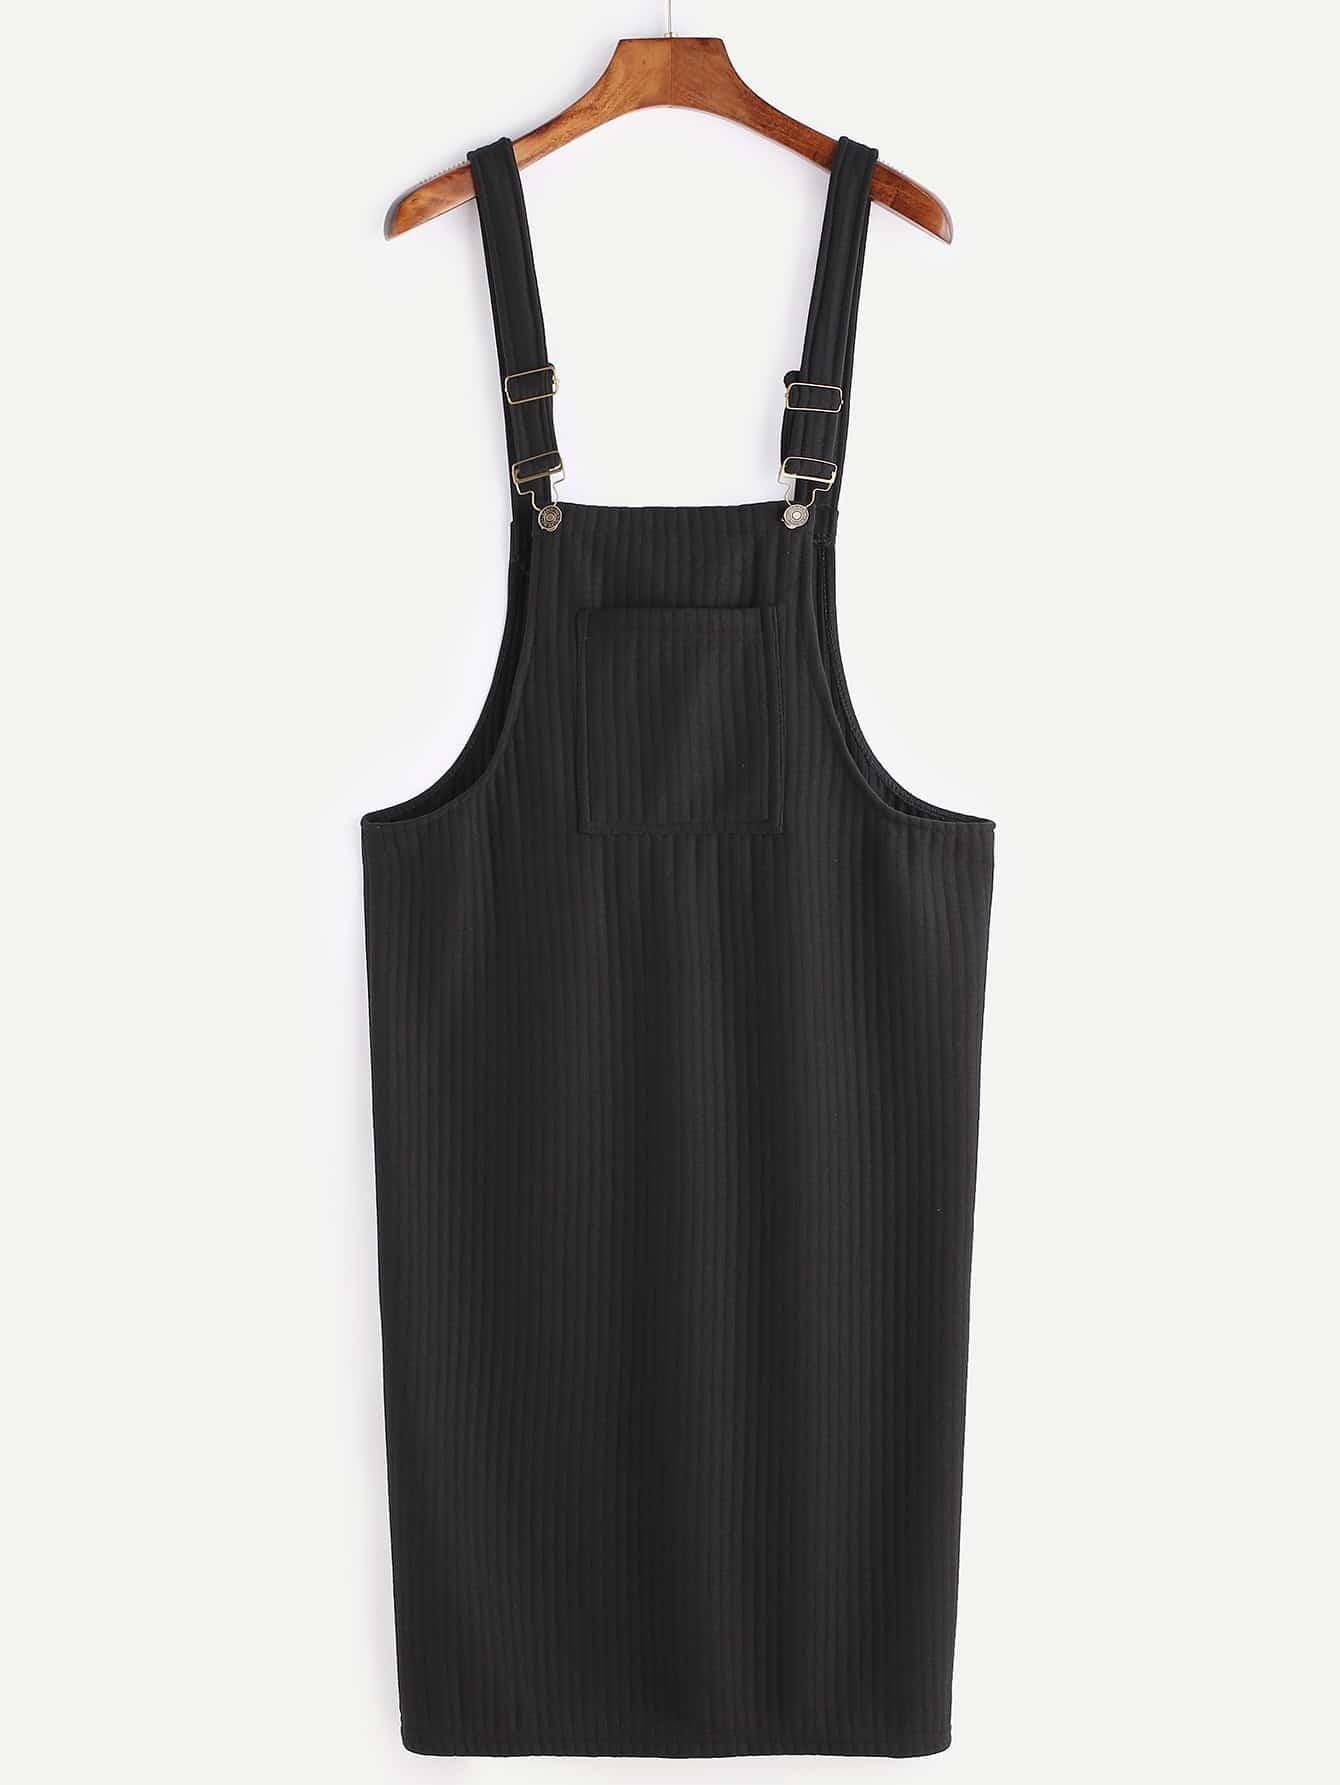 Black Ribbed Pinafore Dress With Pockets